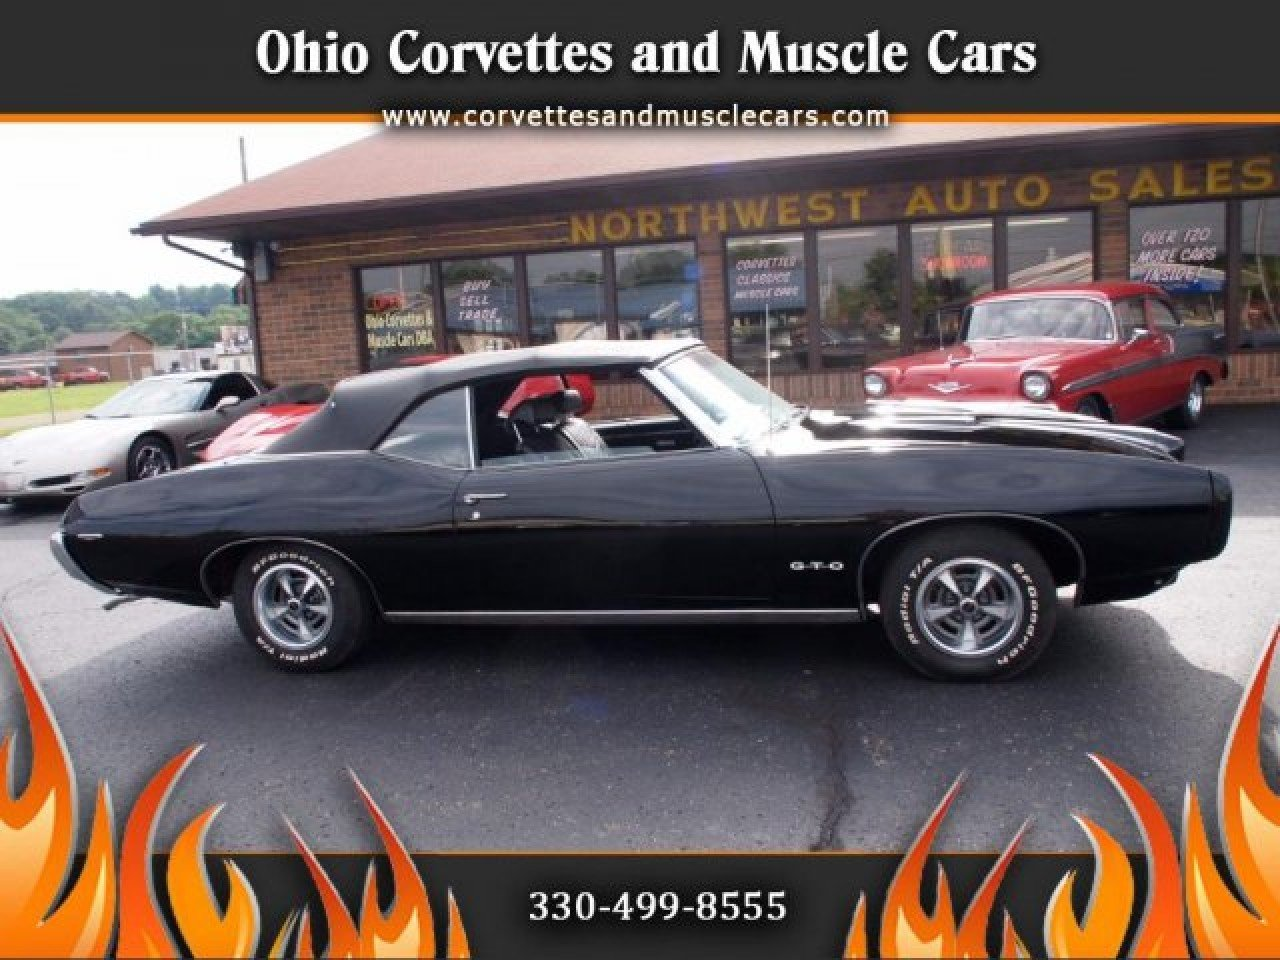 Classic Cars For Sale Auto Trader Com: 1969 Pontiac GTO For Sale Near North Canton, Ohio 44720